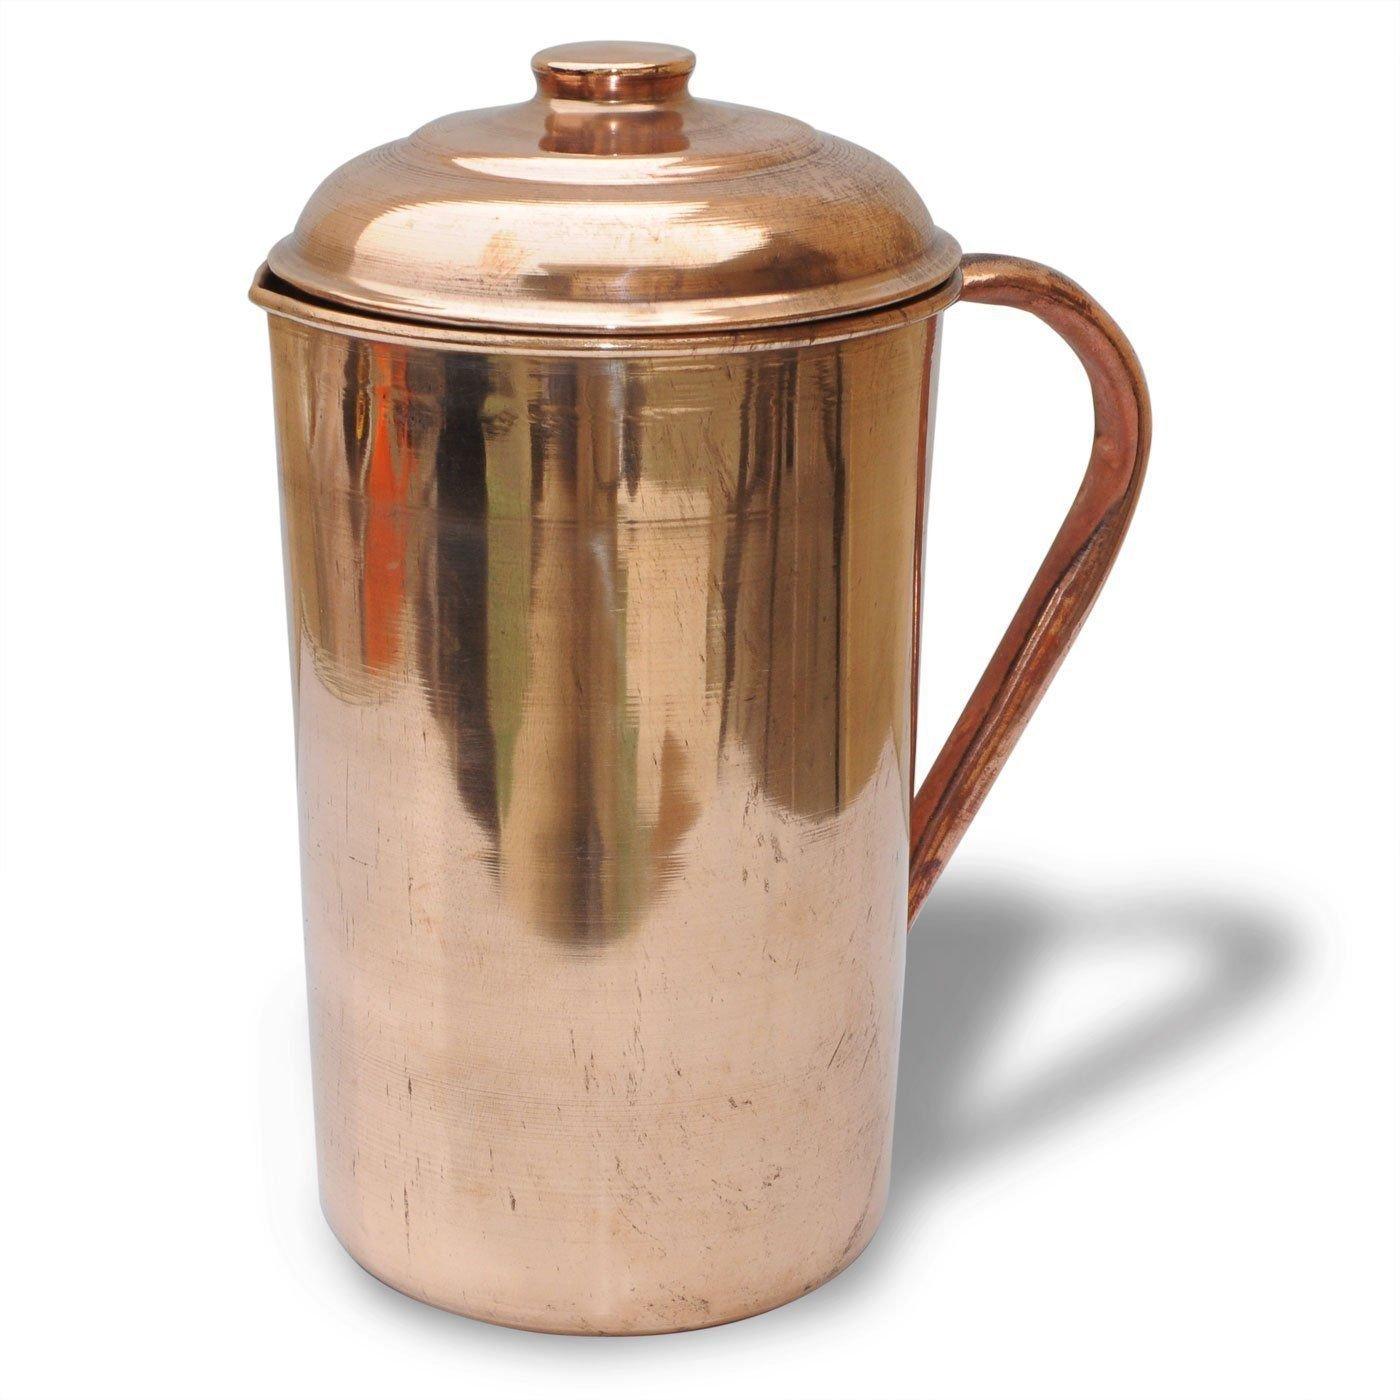 Biz2Frnds Pure Copper Pitcher (in/out) with lid cover 62 oz Jug Ayurveda Yoga Health Biz2Frnds Ayurveda